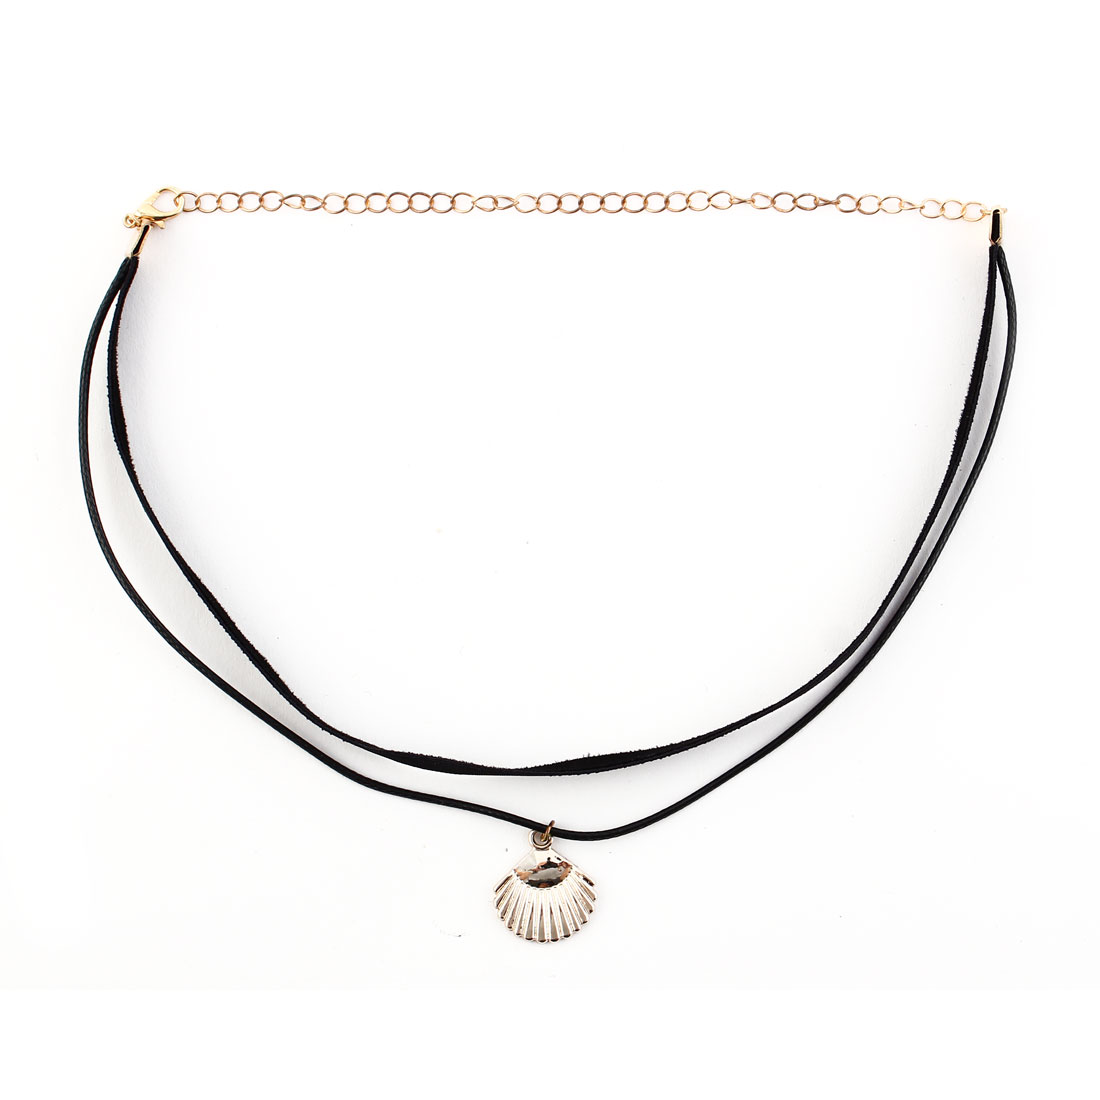 Women Ladies Faux Leather Shell Pendant Adjustable Choker Necklace Neck Chain Black